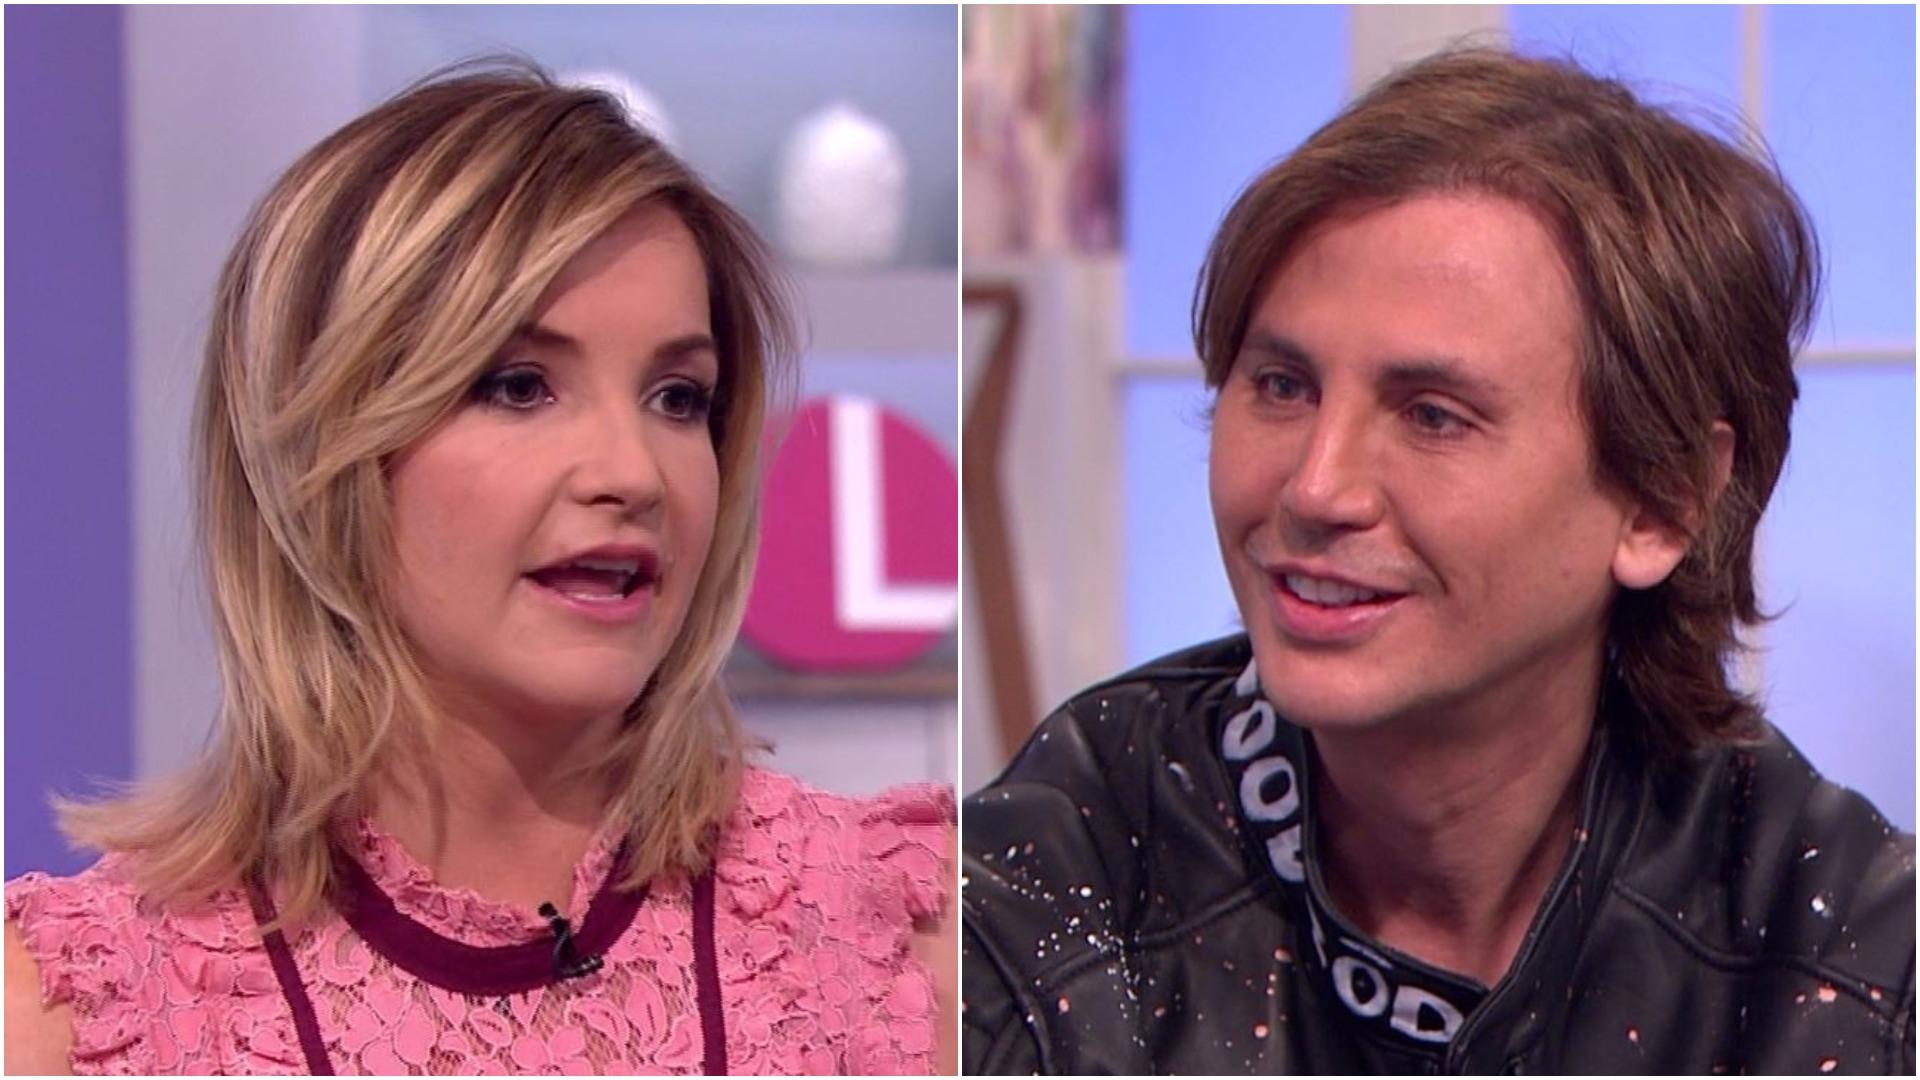 ITV viewers sickened as Helen Skelton asks Jonathan Cheban about having diarrhoea on Lorraine